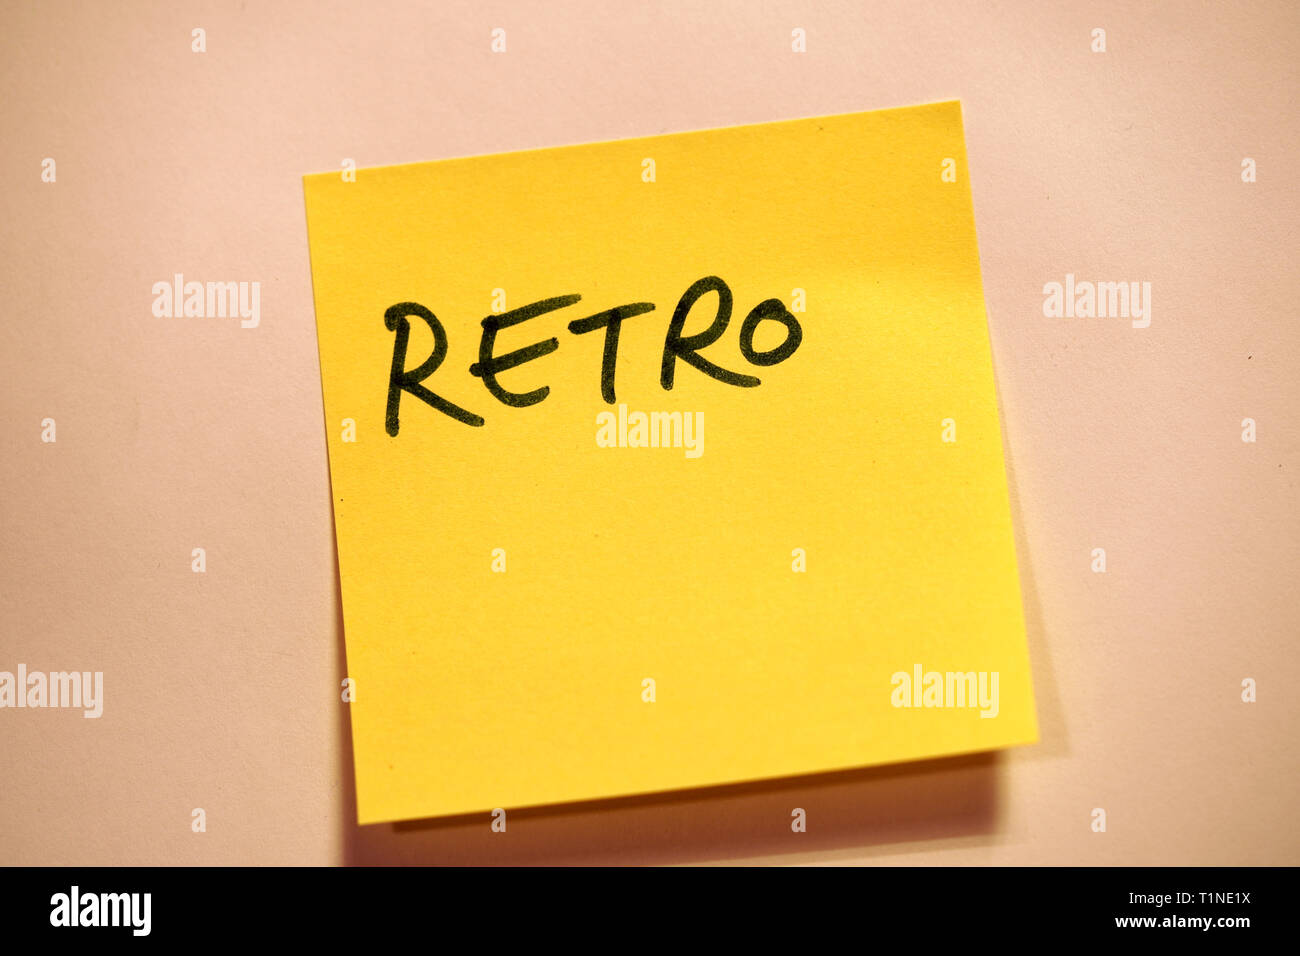 Yellow Sticky Note Scrum Agile Retro - Stock Image